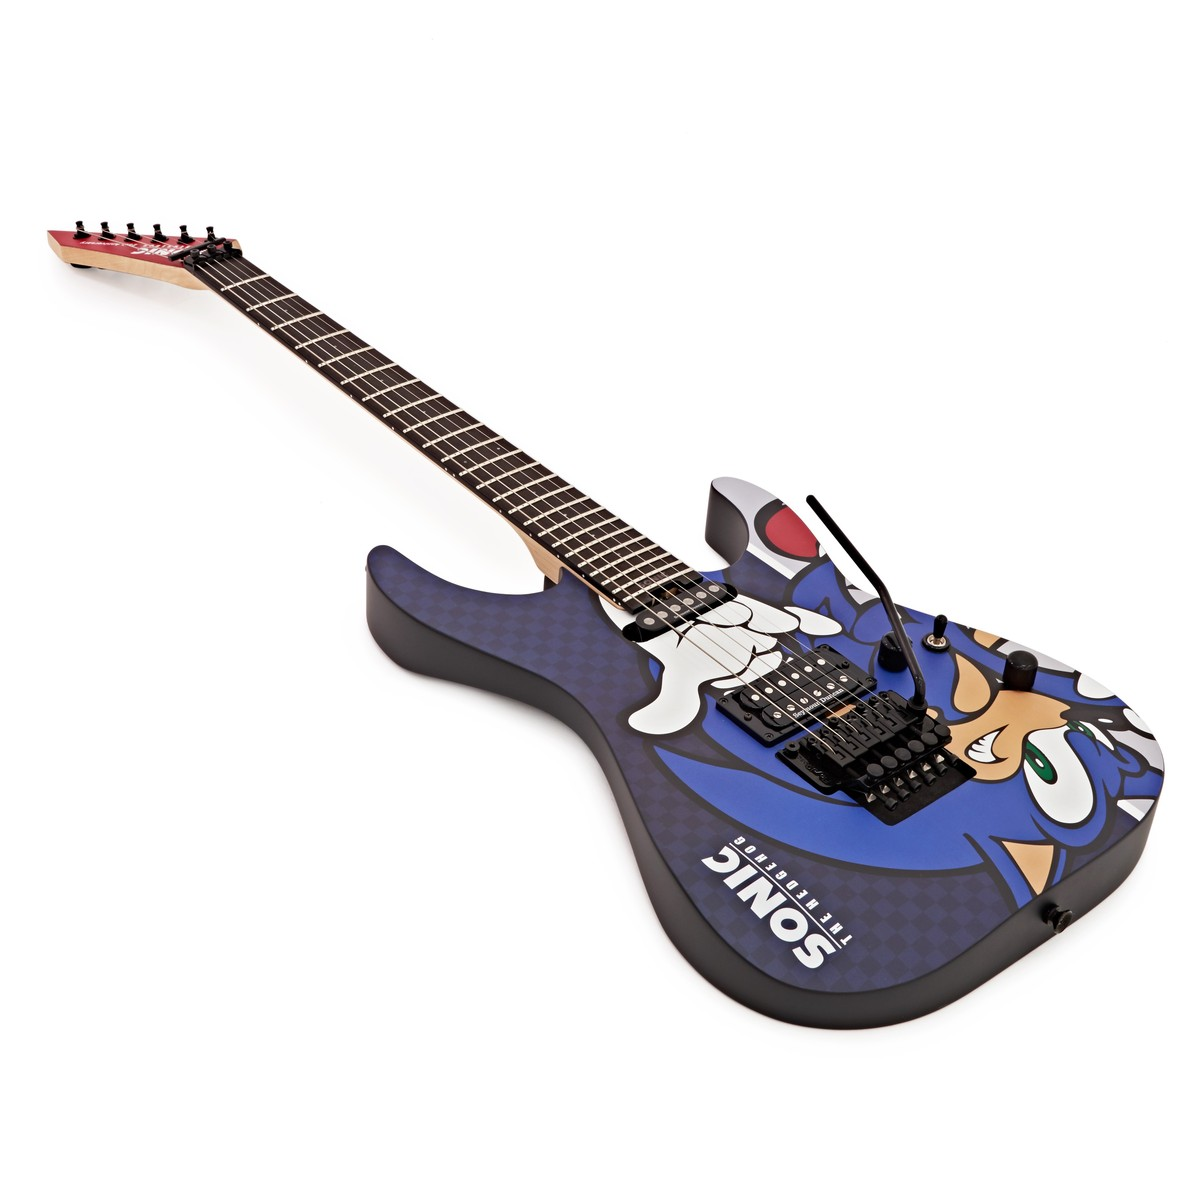 esp sn 25th sonic the hedgehog guitar ii at. Black Bedroom Furniture Sets. Home Design Ideas